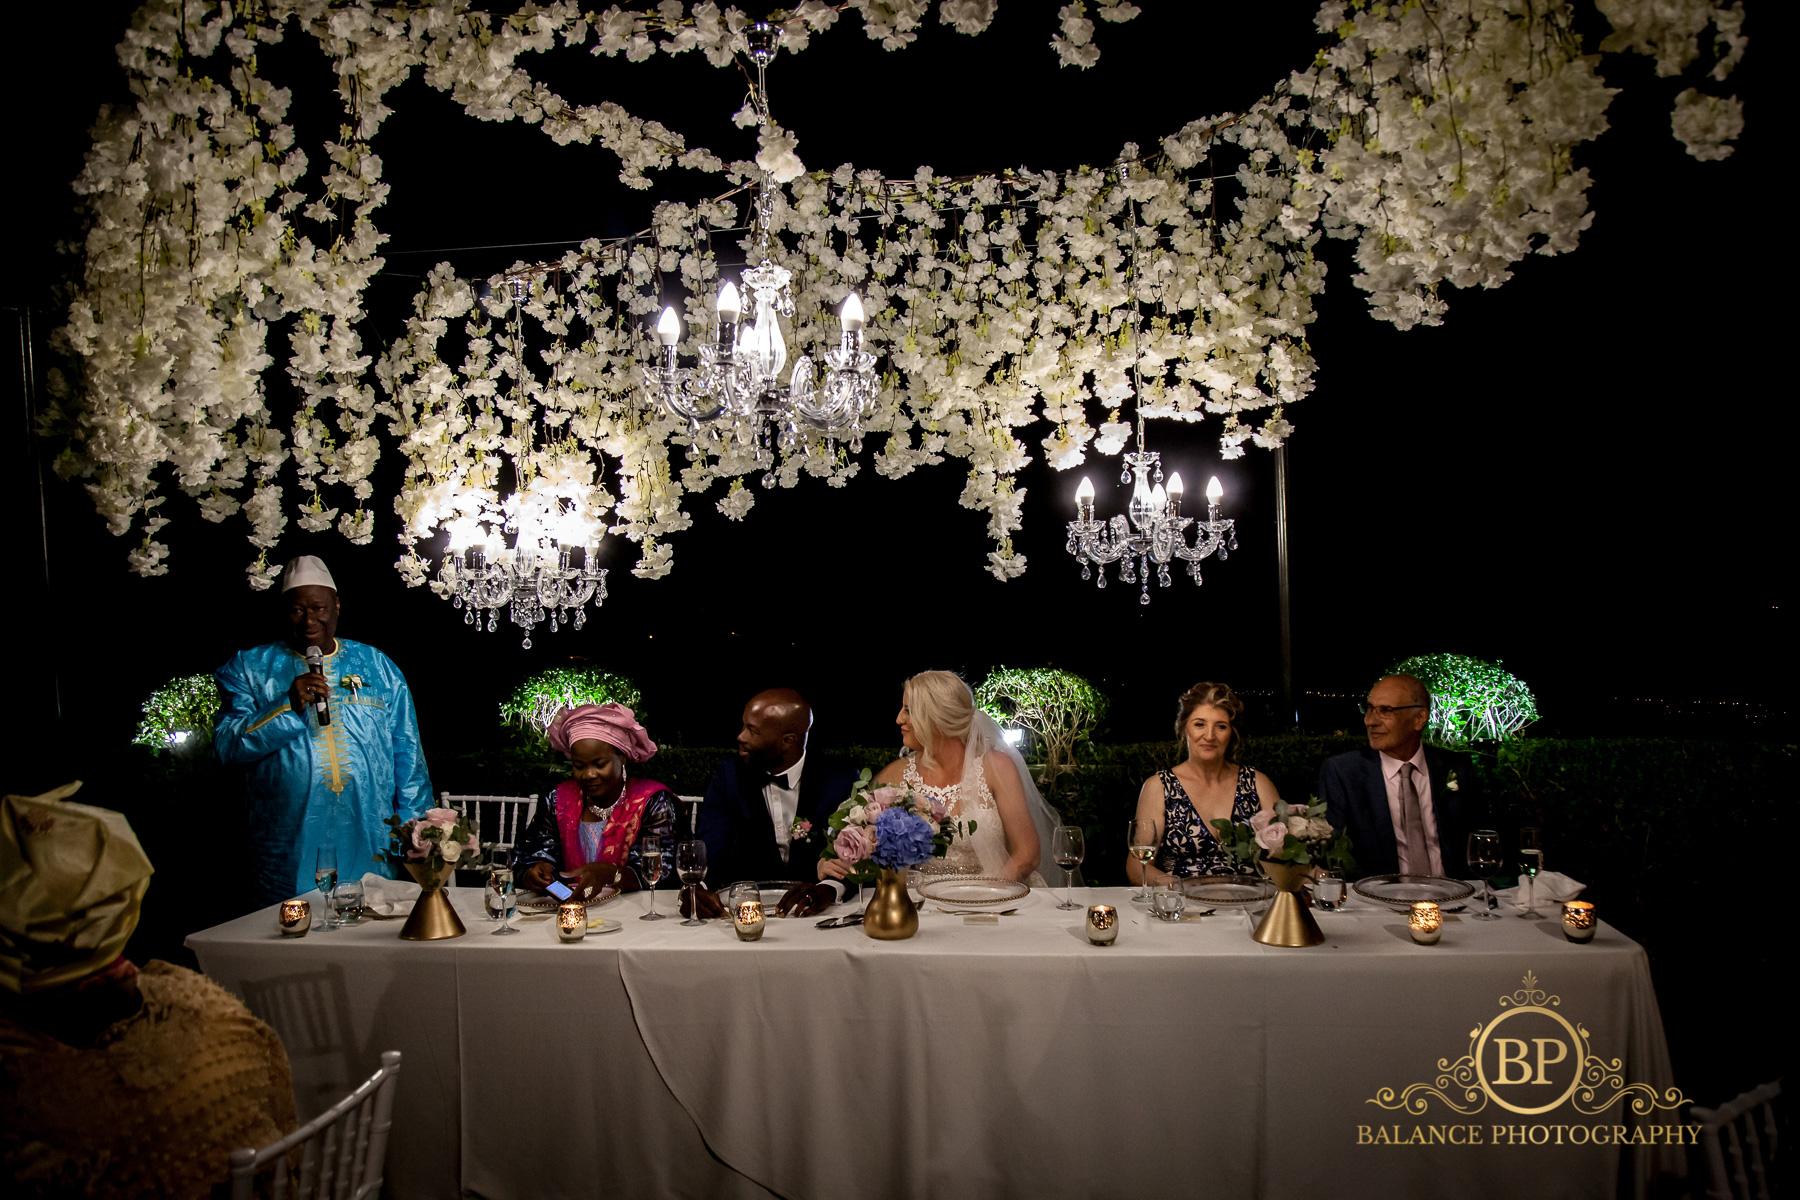 The wedding breakfast - Balance Photography